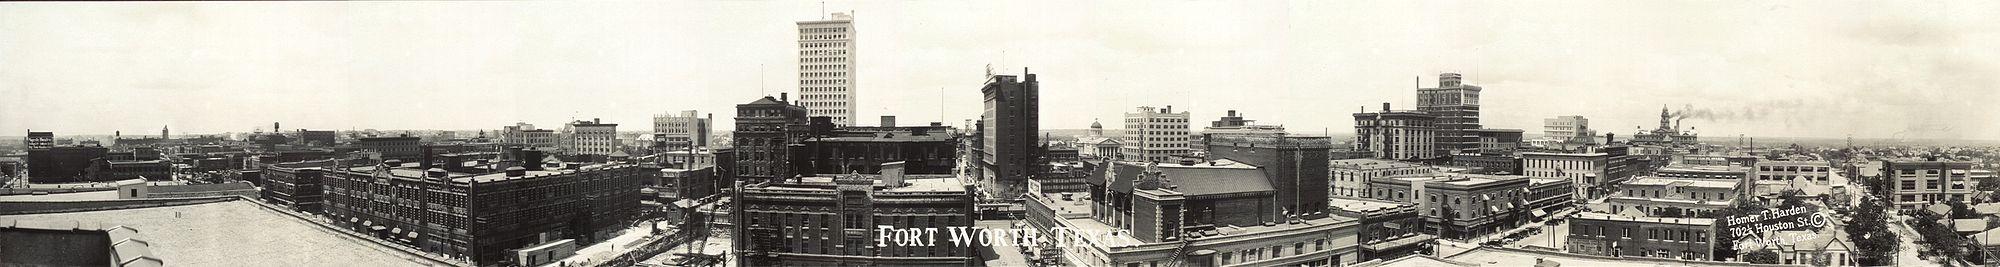 Fort Worth c1920 loc 6a14633